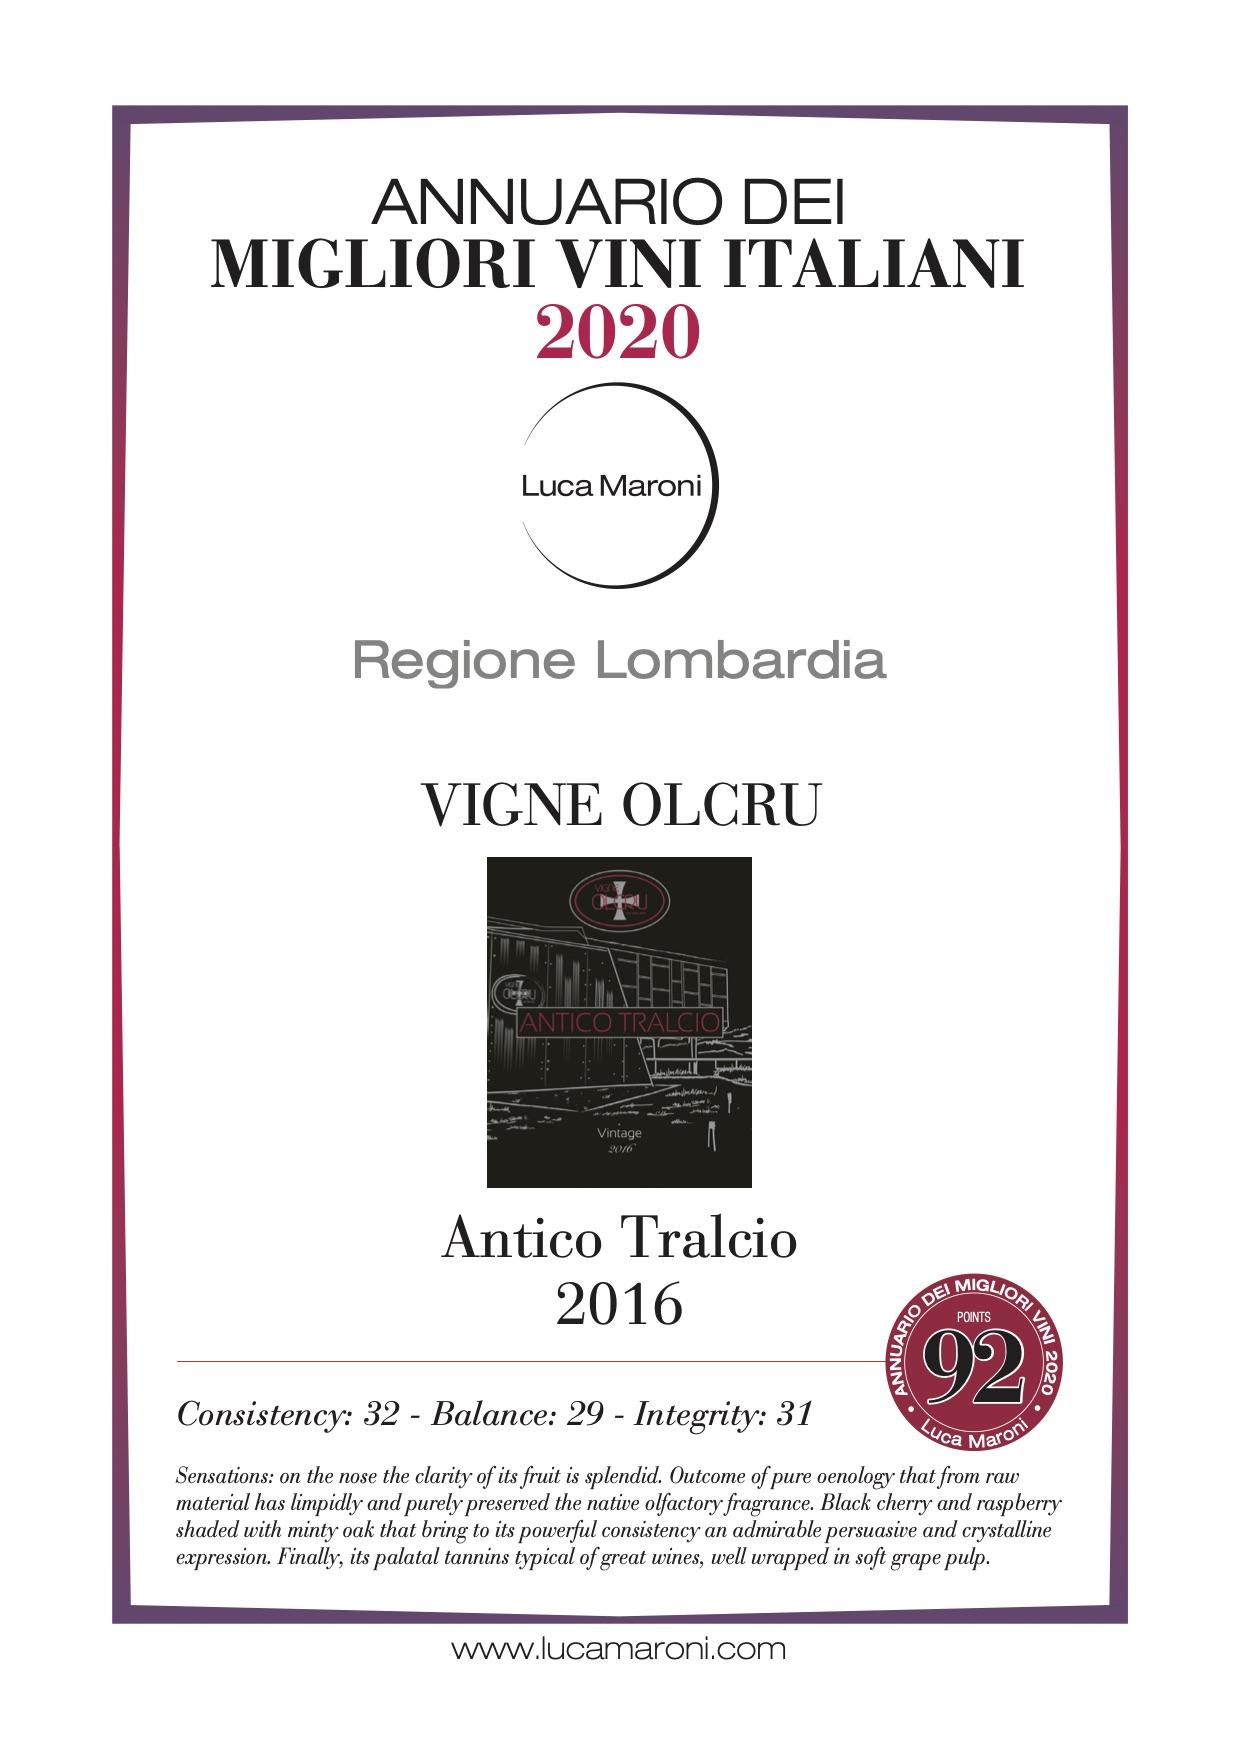 Luca Maroni 2020 – Antico Tralcio 2016 eng